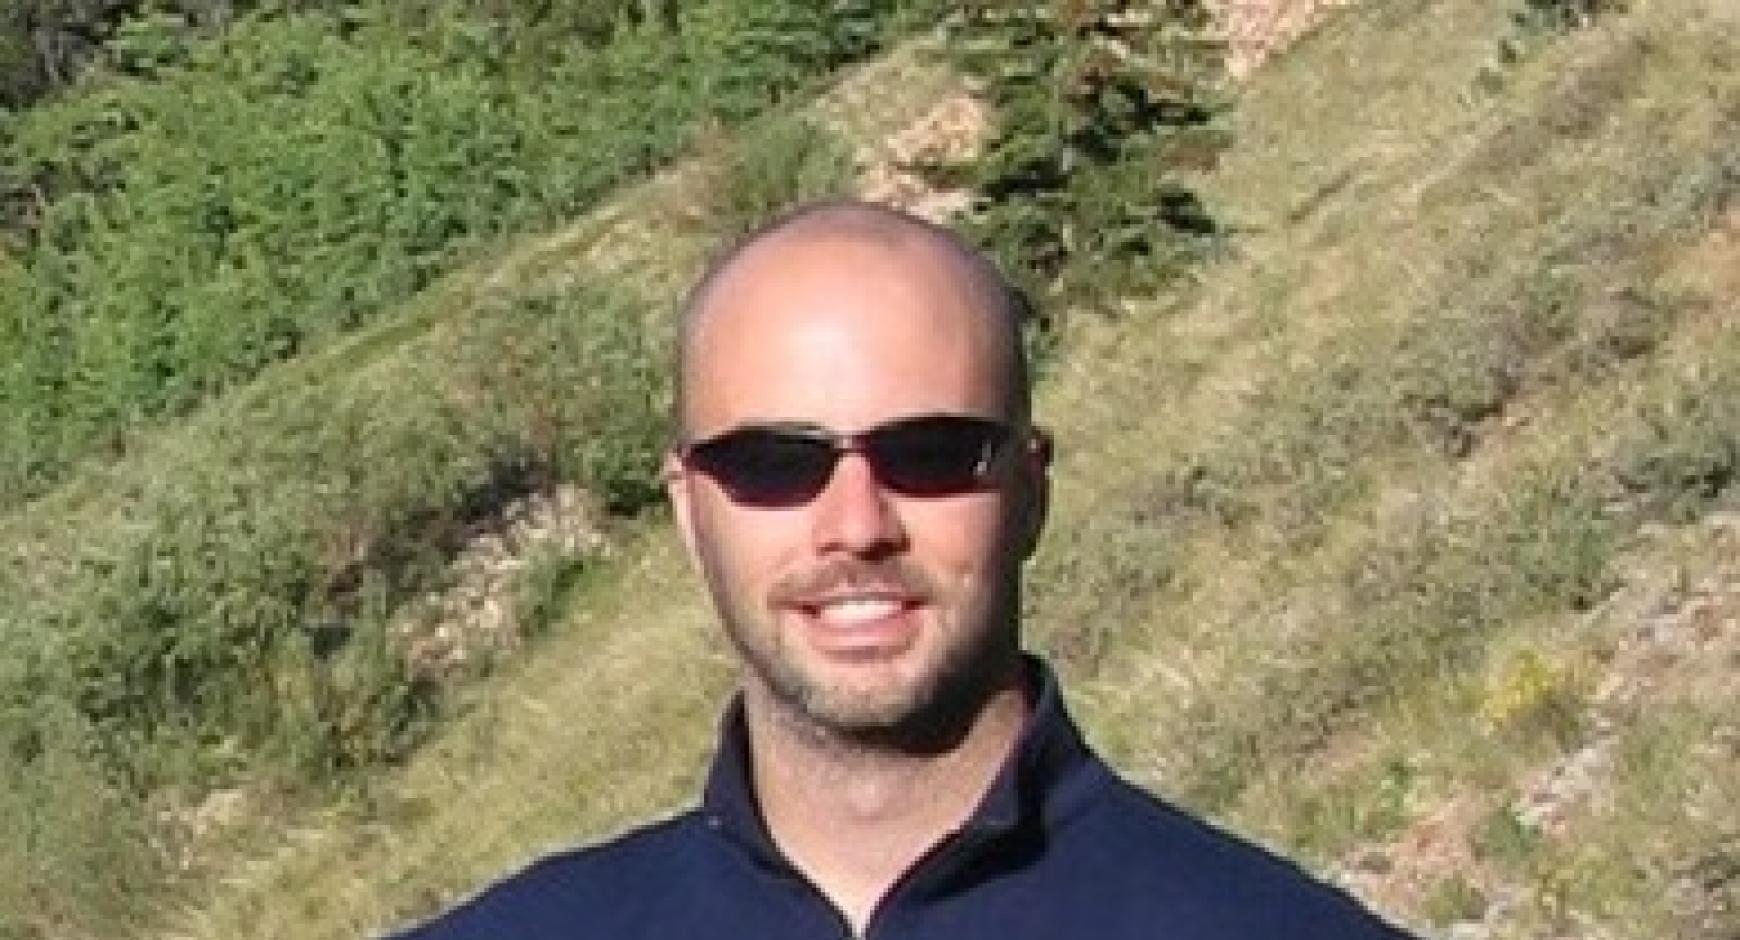 Professor Tony Grubesic